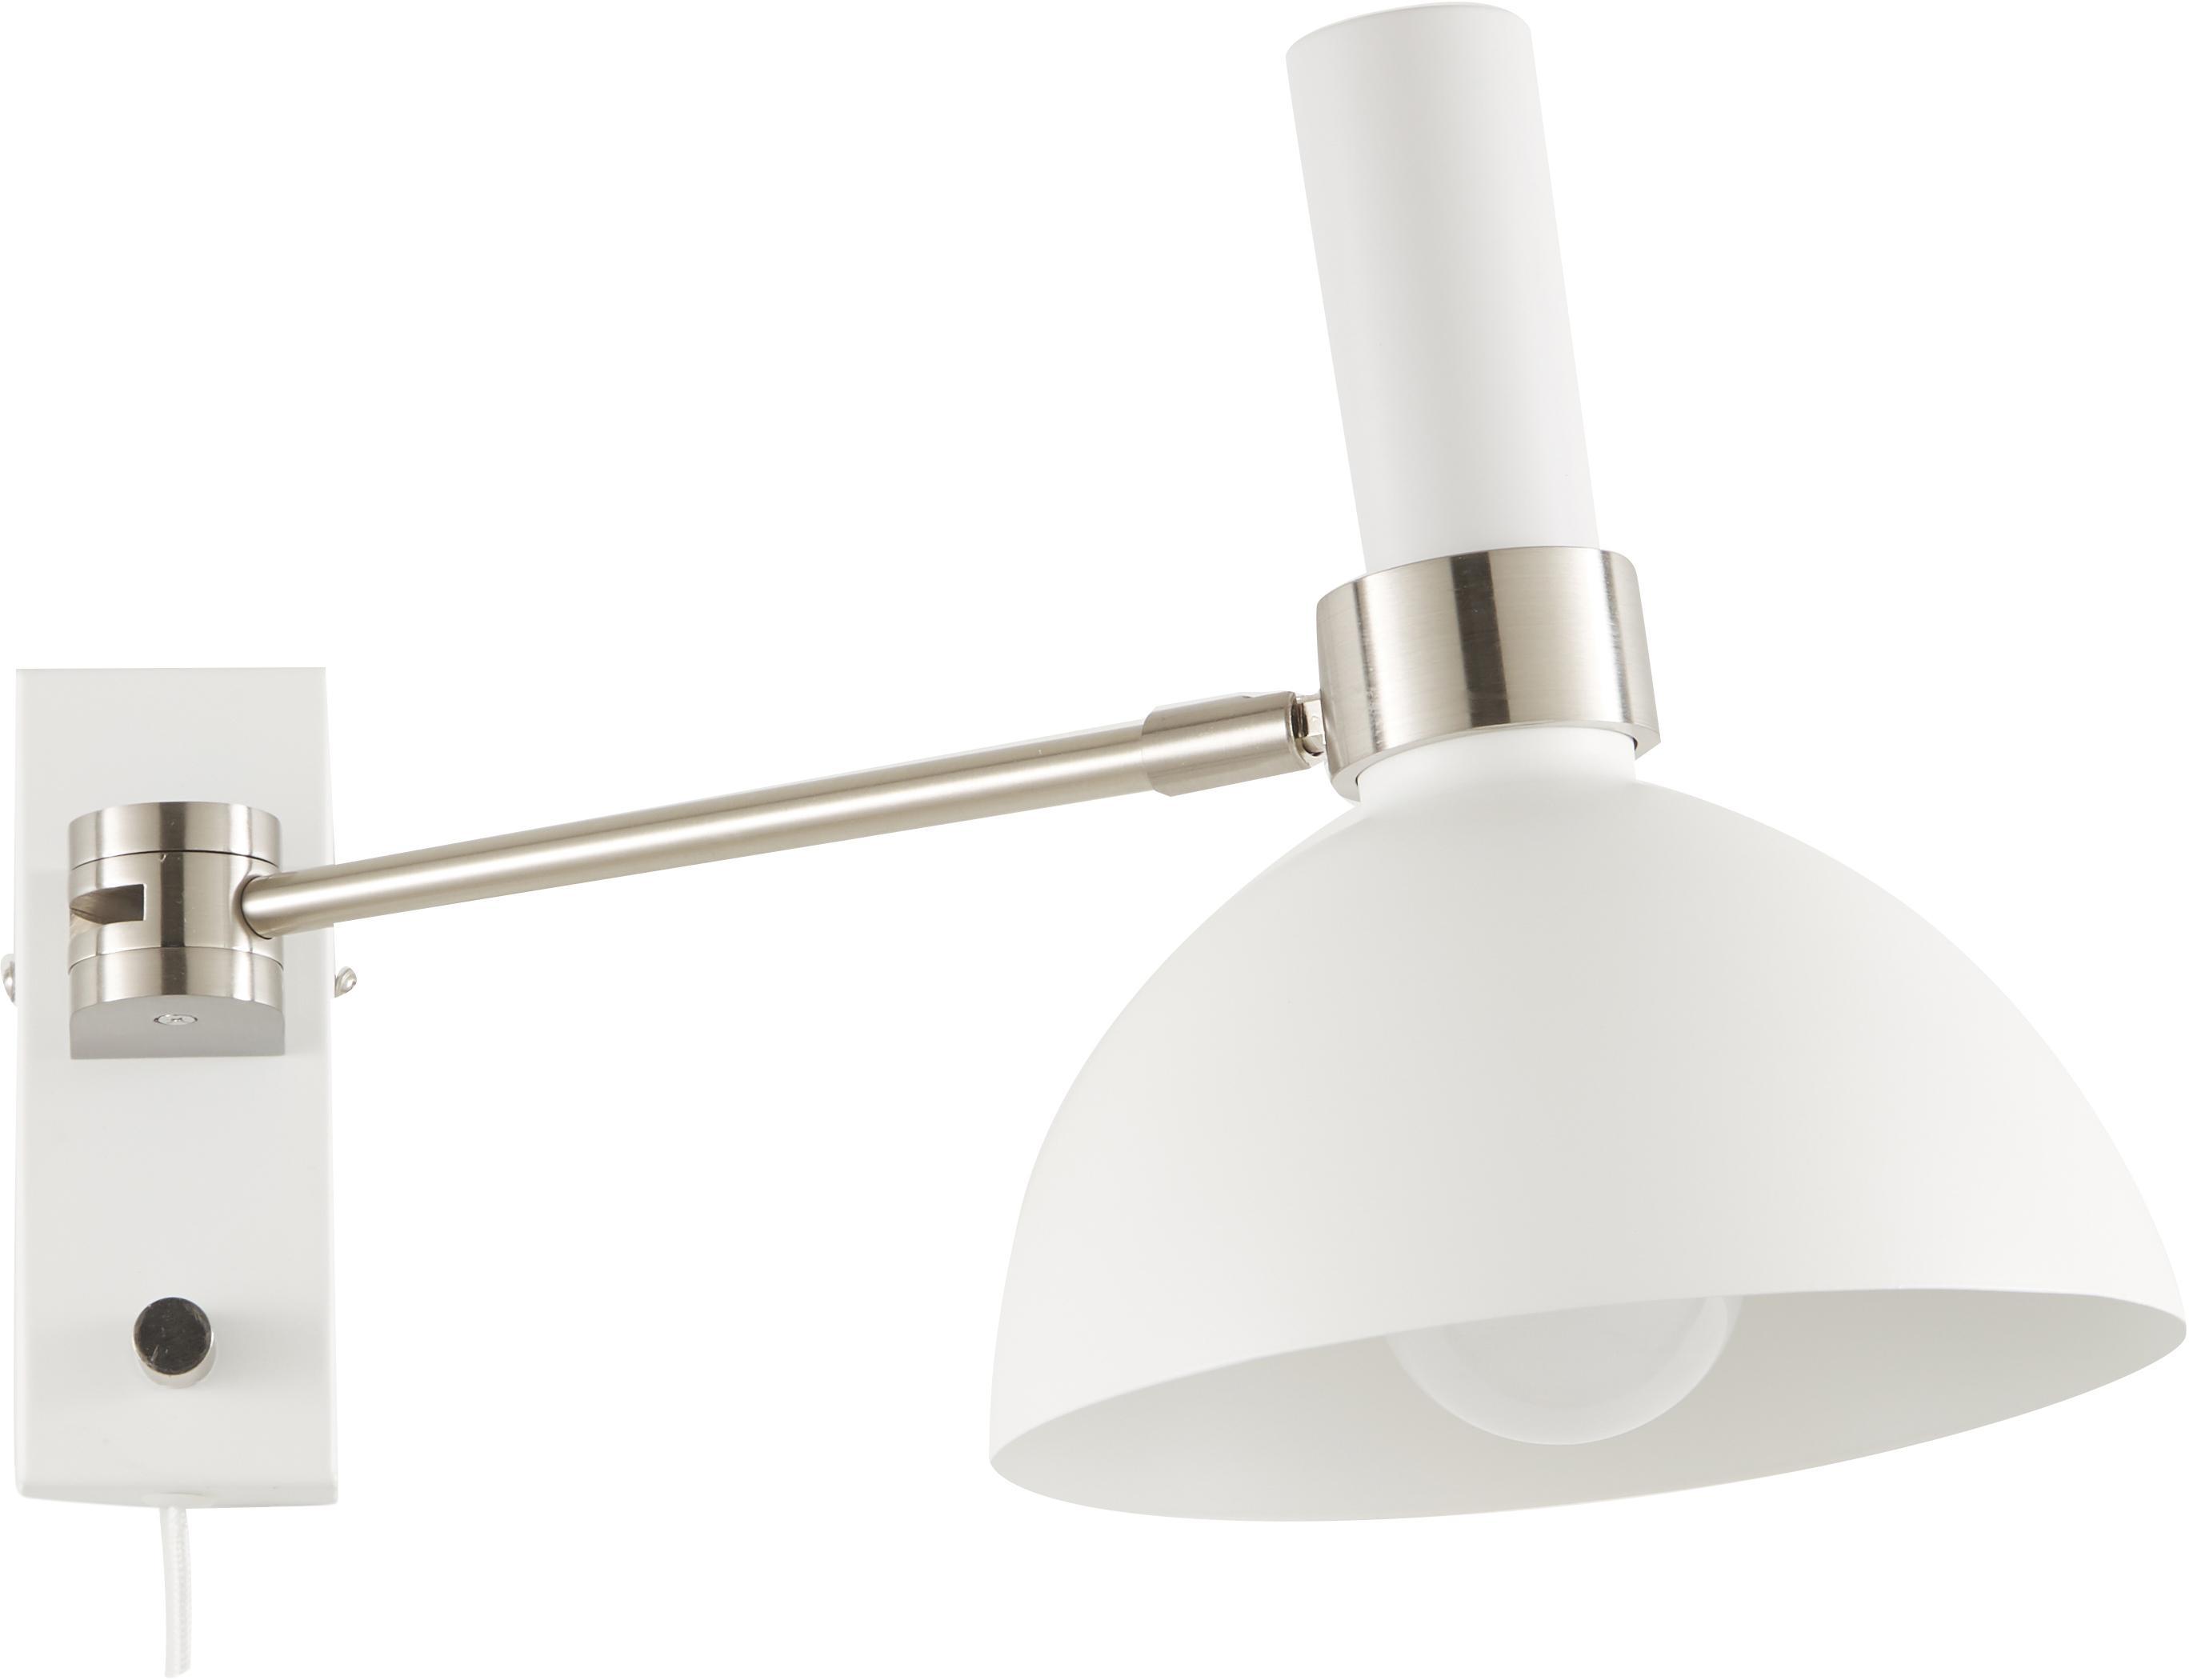 Dimbare wandlamp Larry, Wit, chroomkleurig, 19 x 24 cm